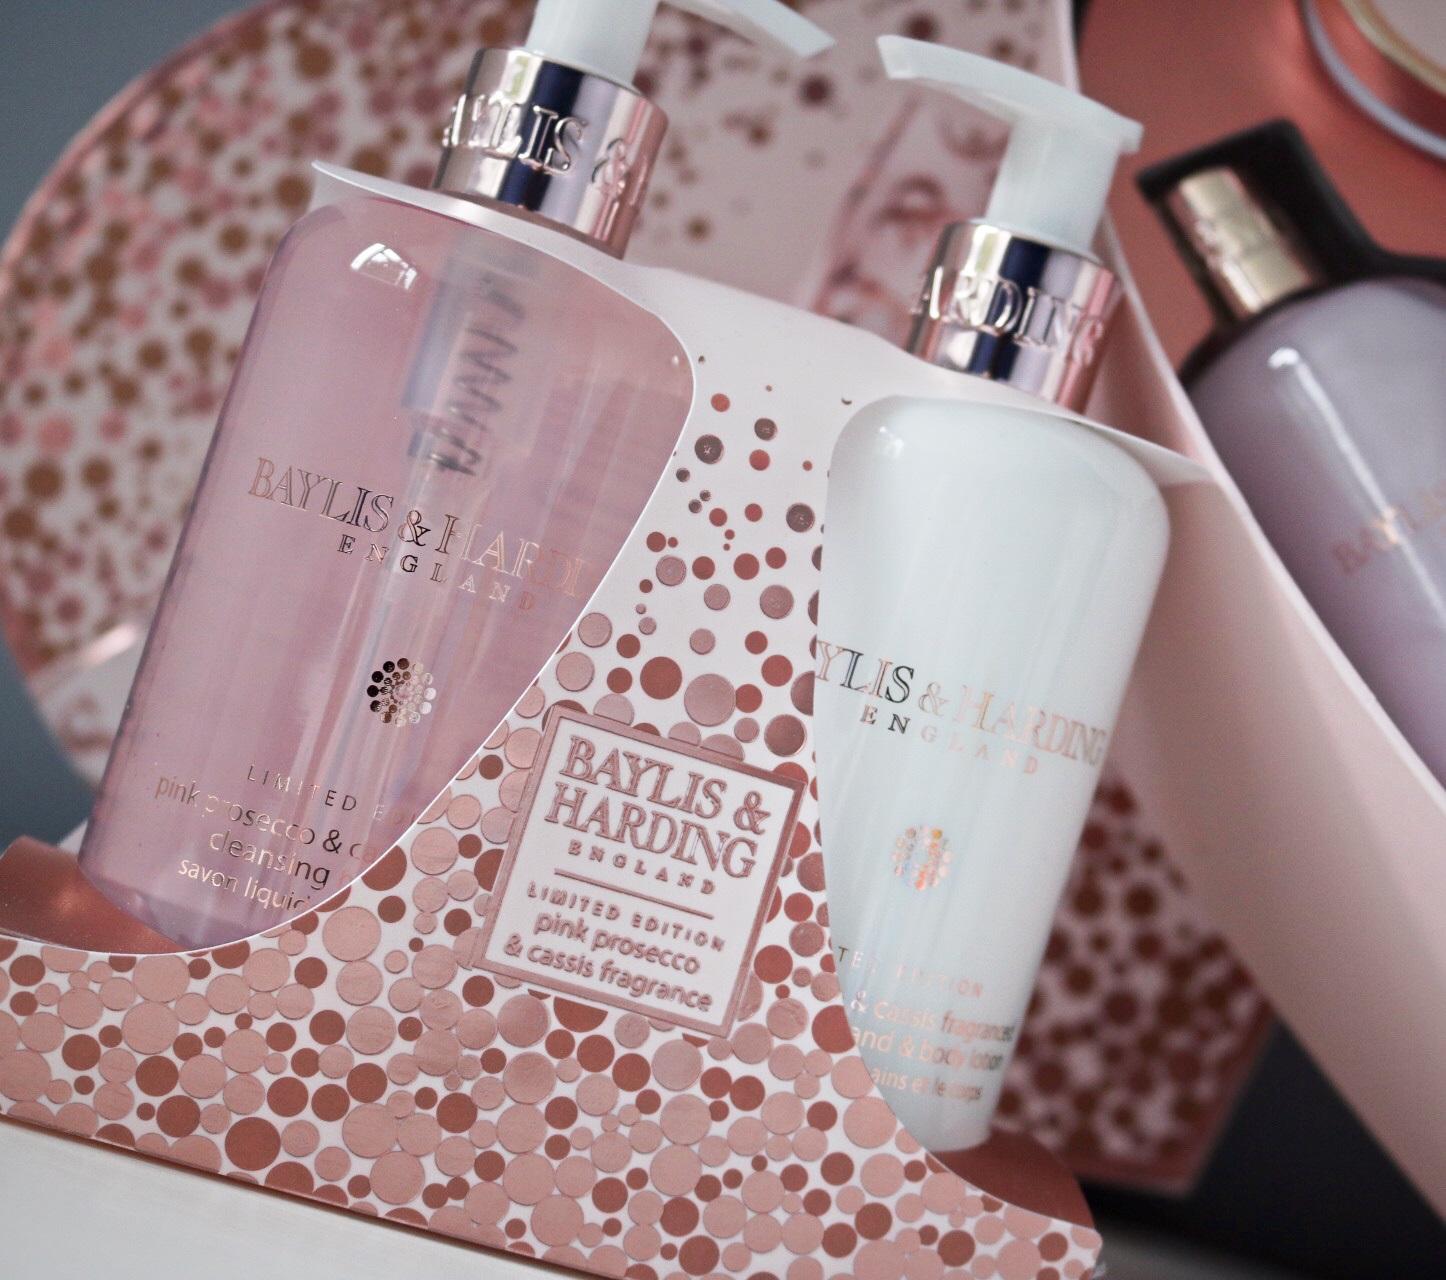 Gift Set Shower Gel & Lotion Health & Beauty Painstaking Baylis & Harding Lilac & English Lavender 3 Pc